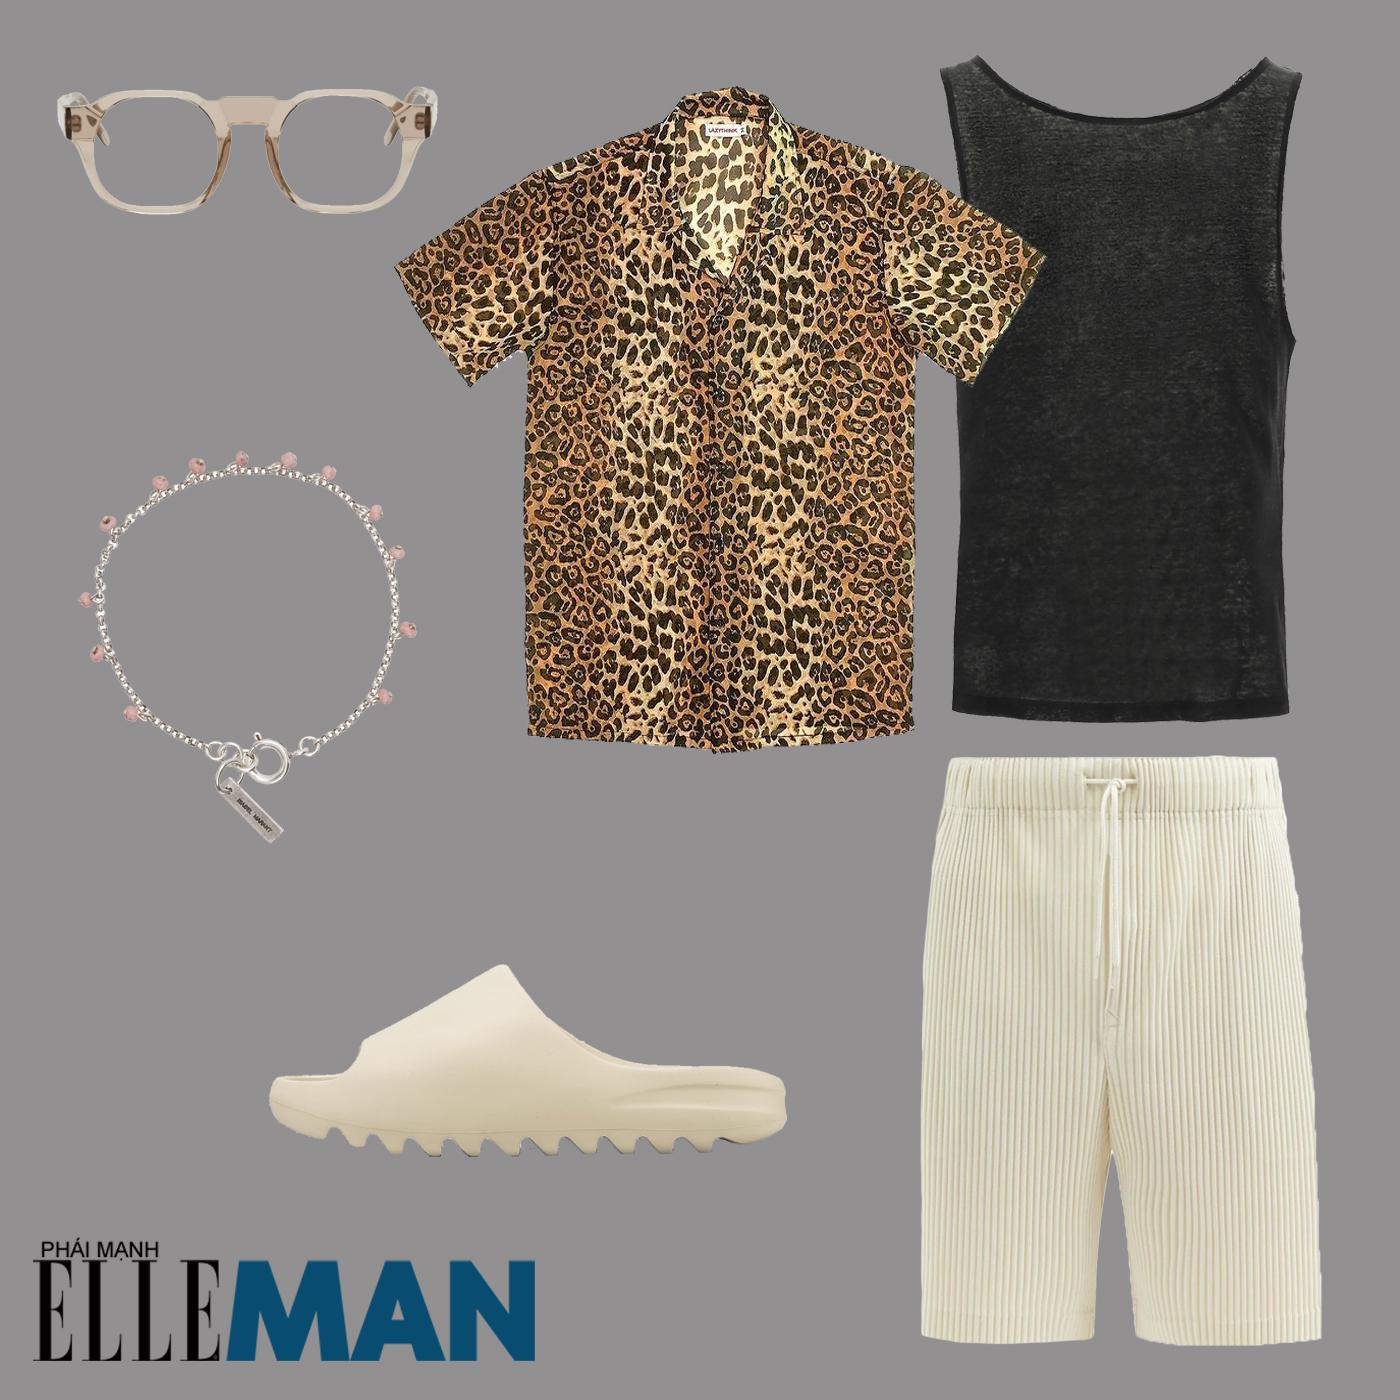 trang phuc linen - elle man style calendar - layout outfit 3